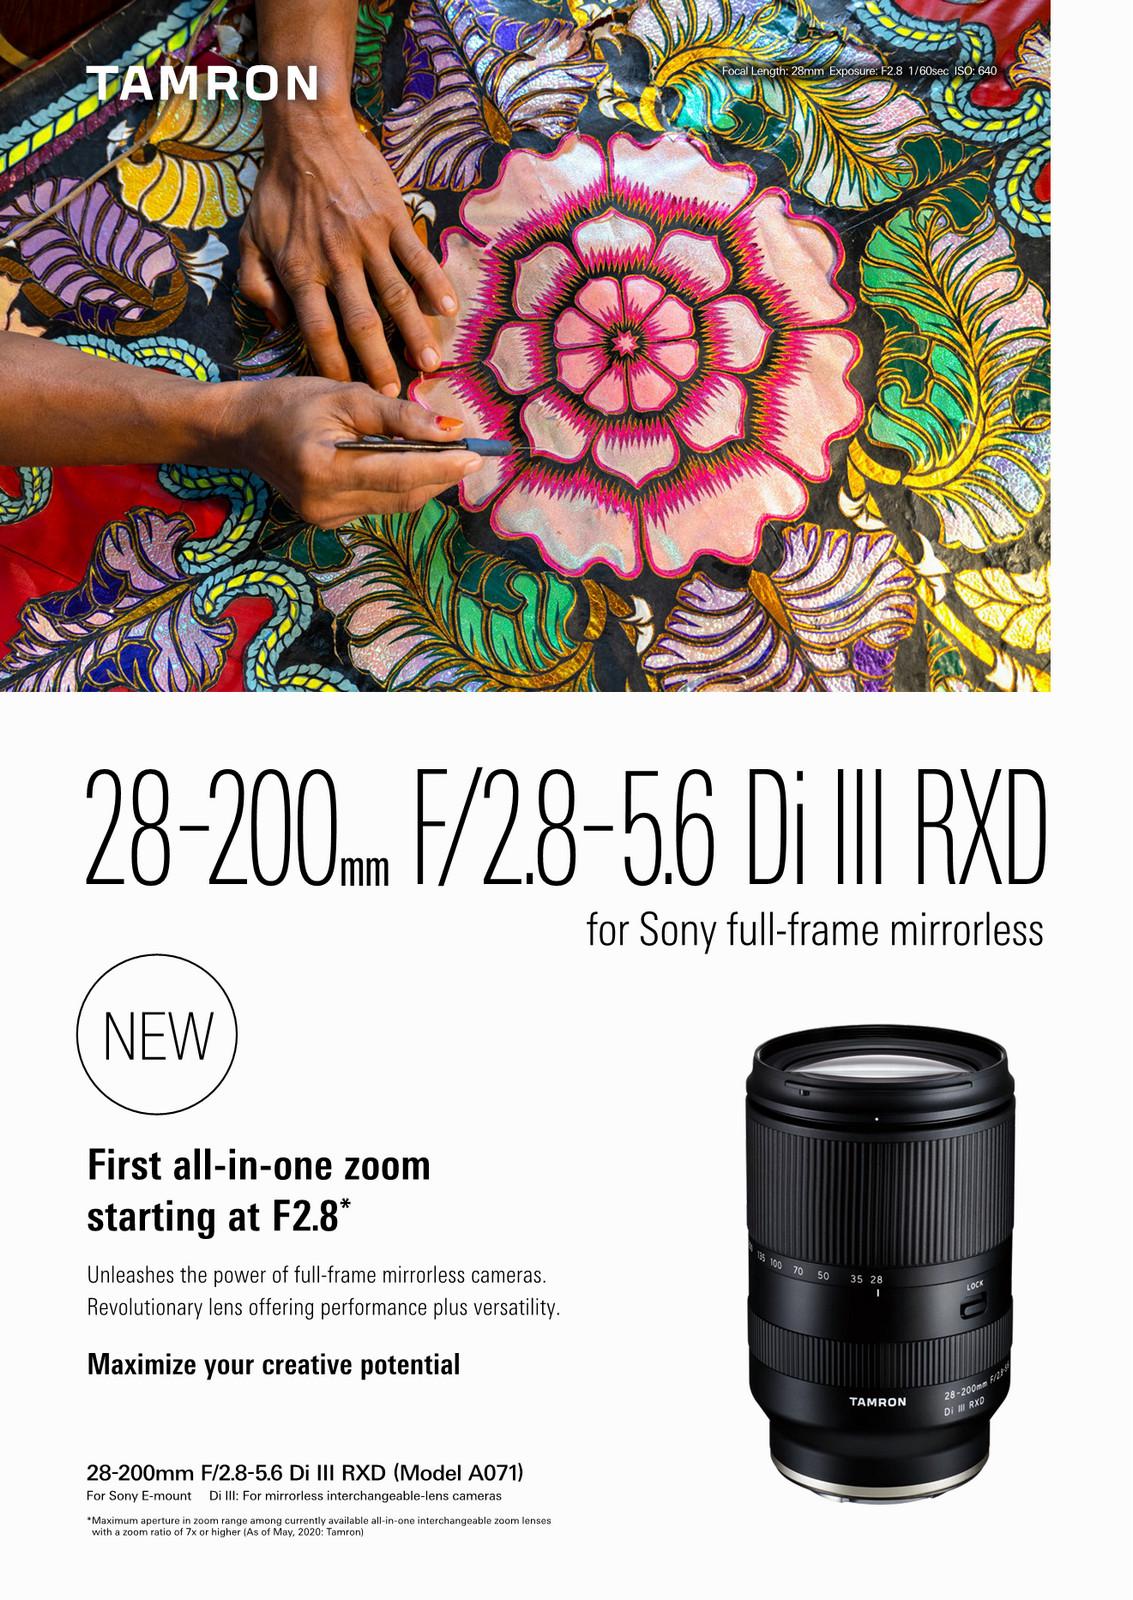 Рекламный буклет для объектива Tamron 28-200mm f/2.8-5.6 Di III RXD (A071)